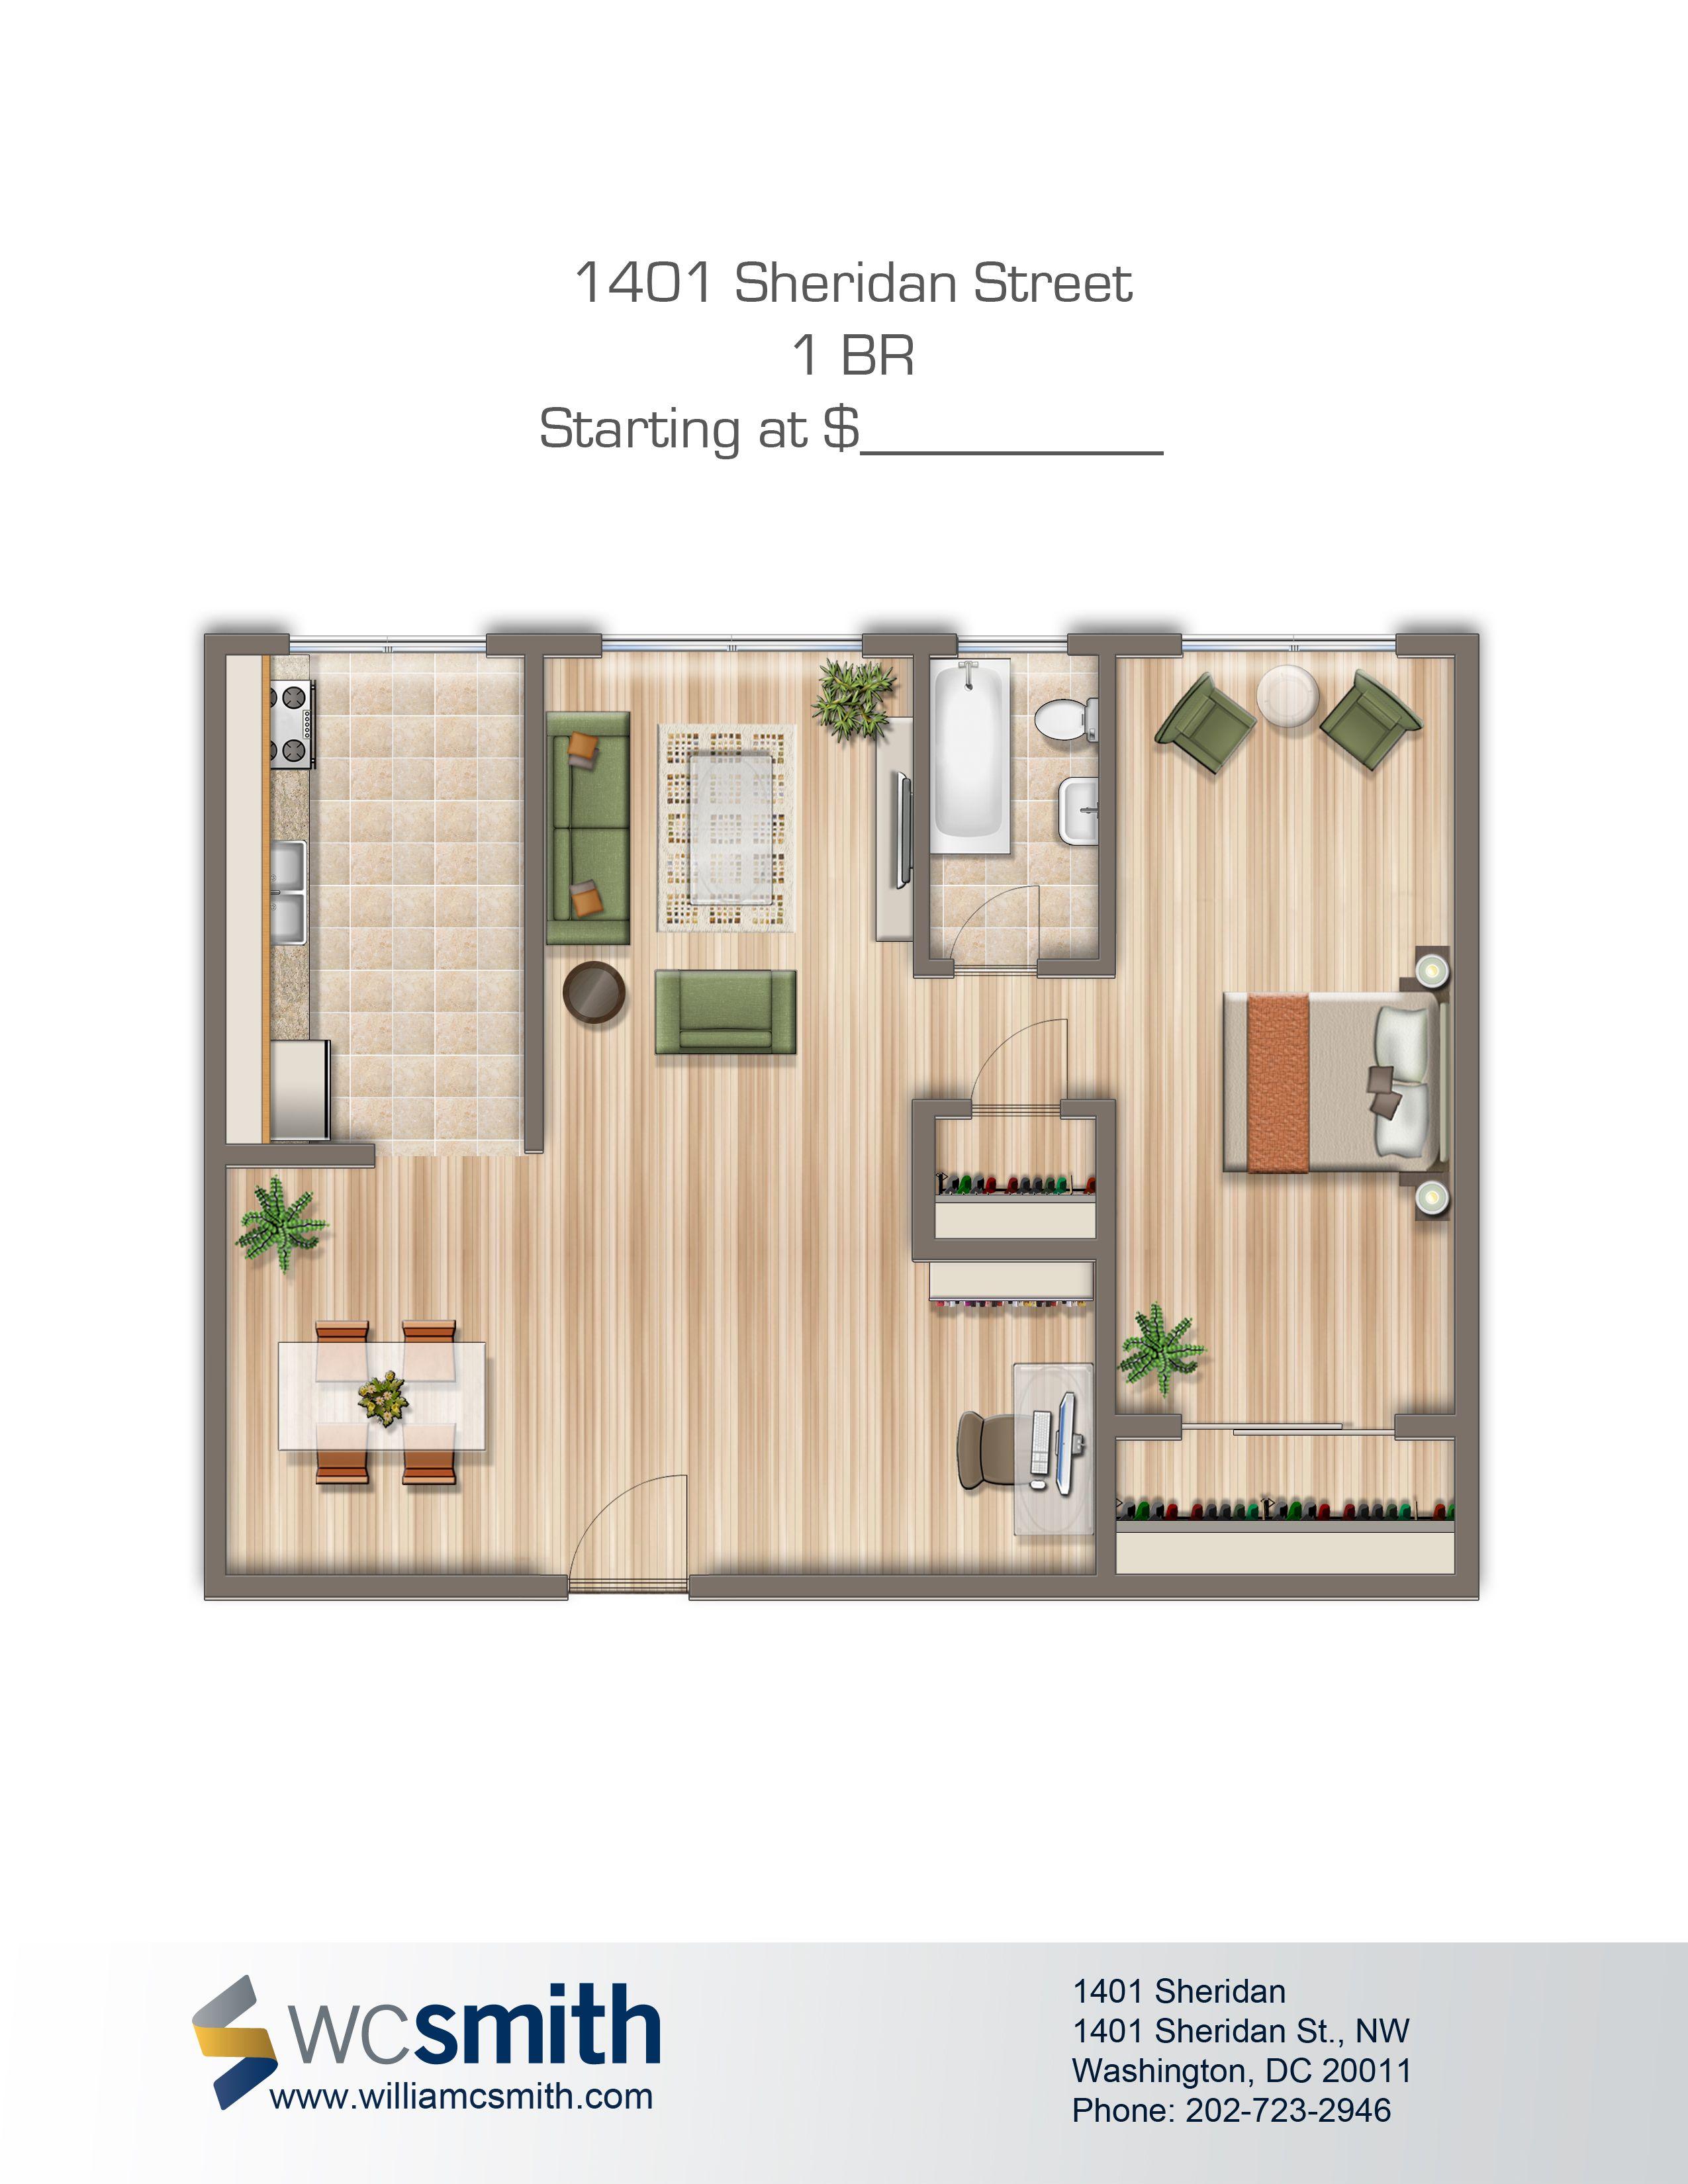 1401 Sheridan St N W Wc Smith Bedroom Flooring Bedroom Floor Plans Living Room Decor Apartment